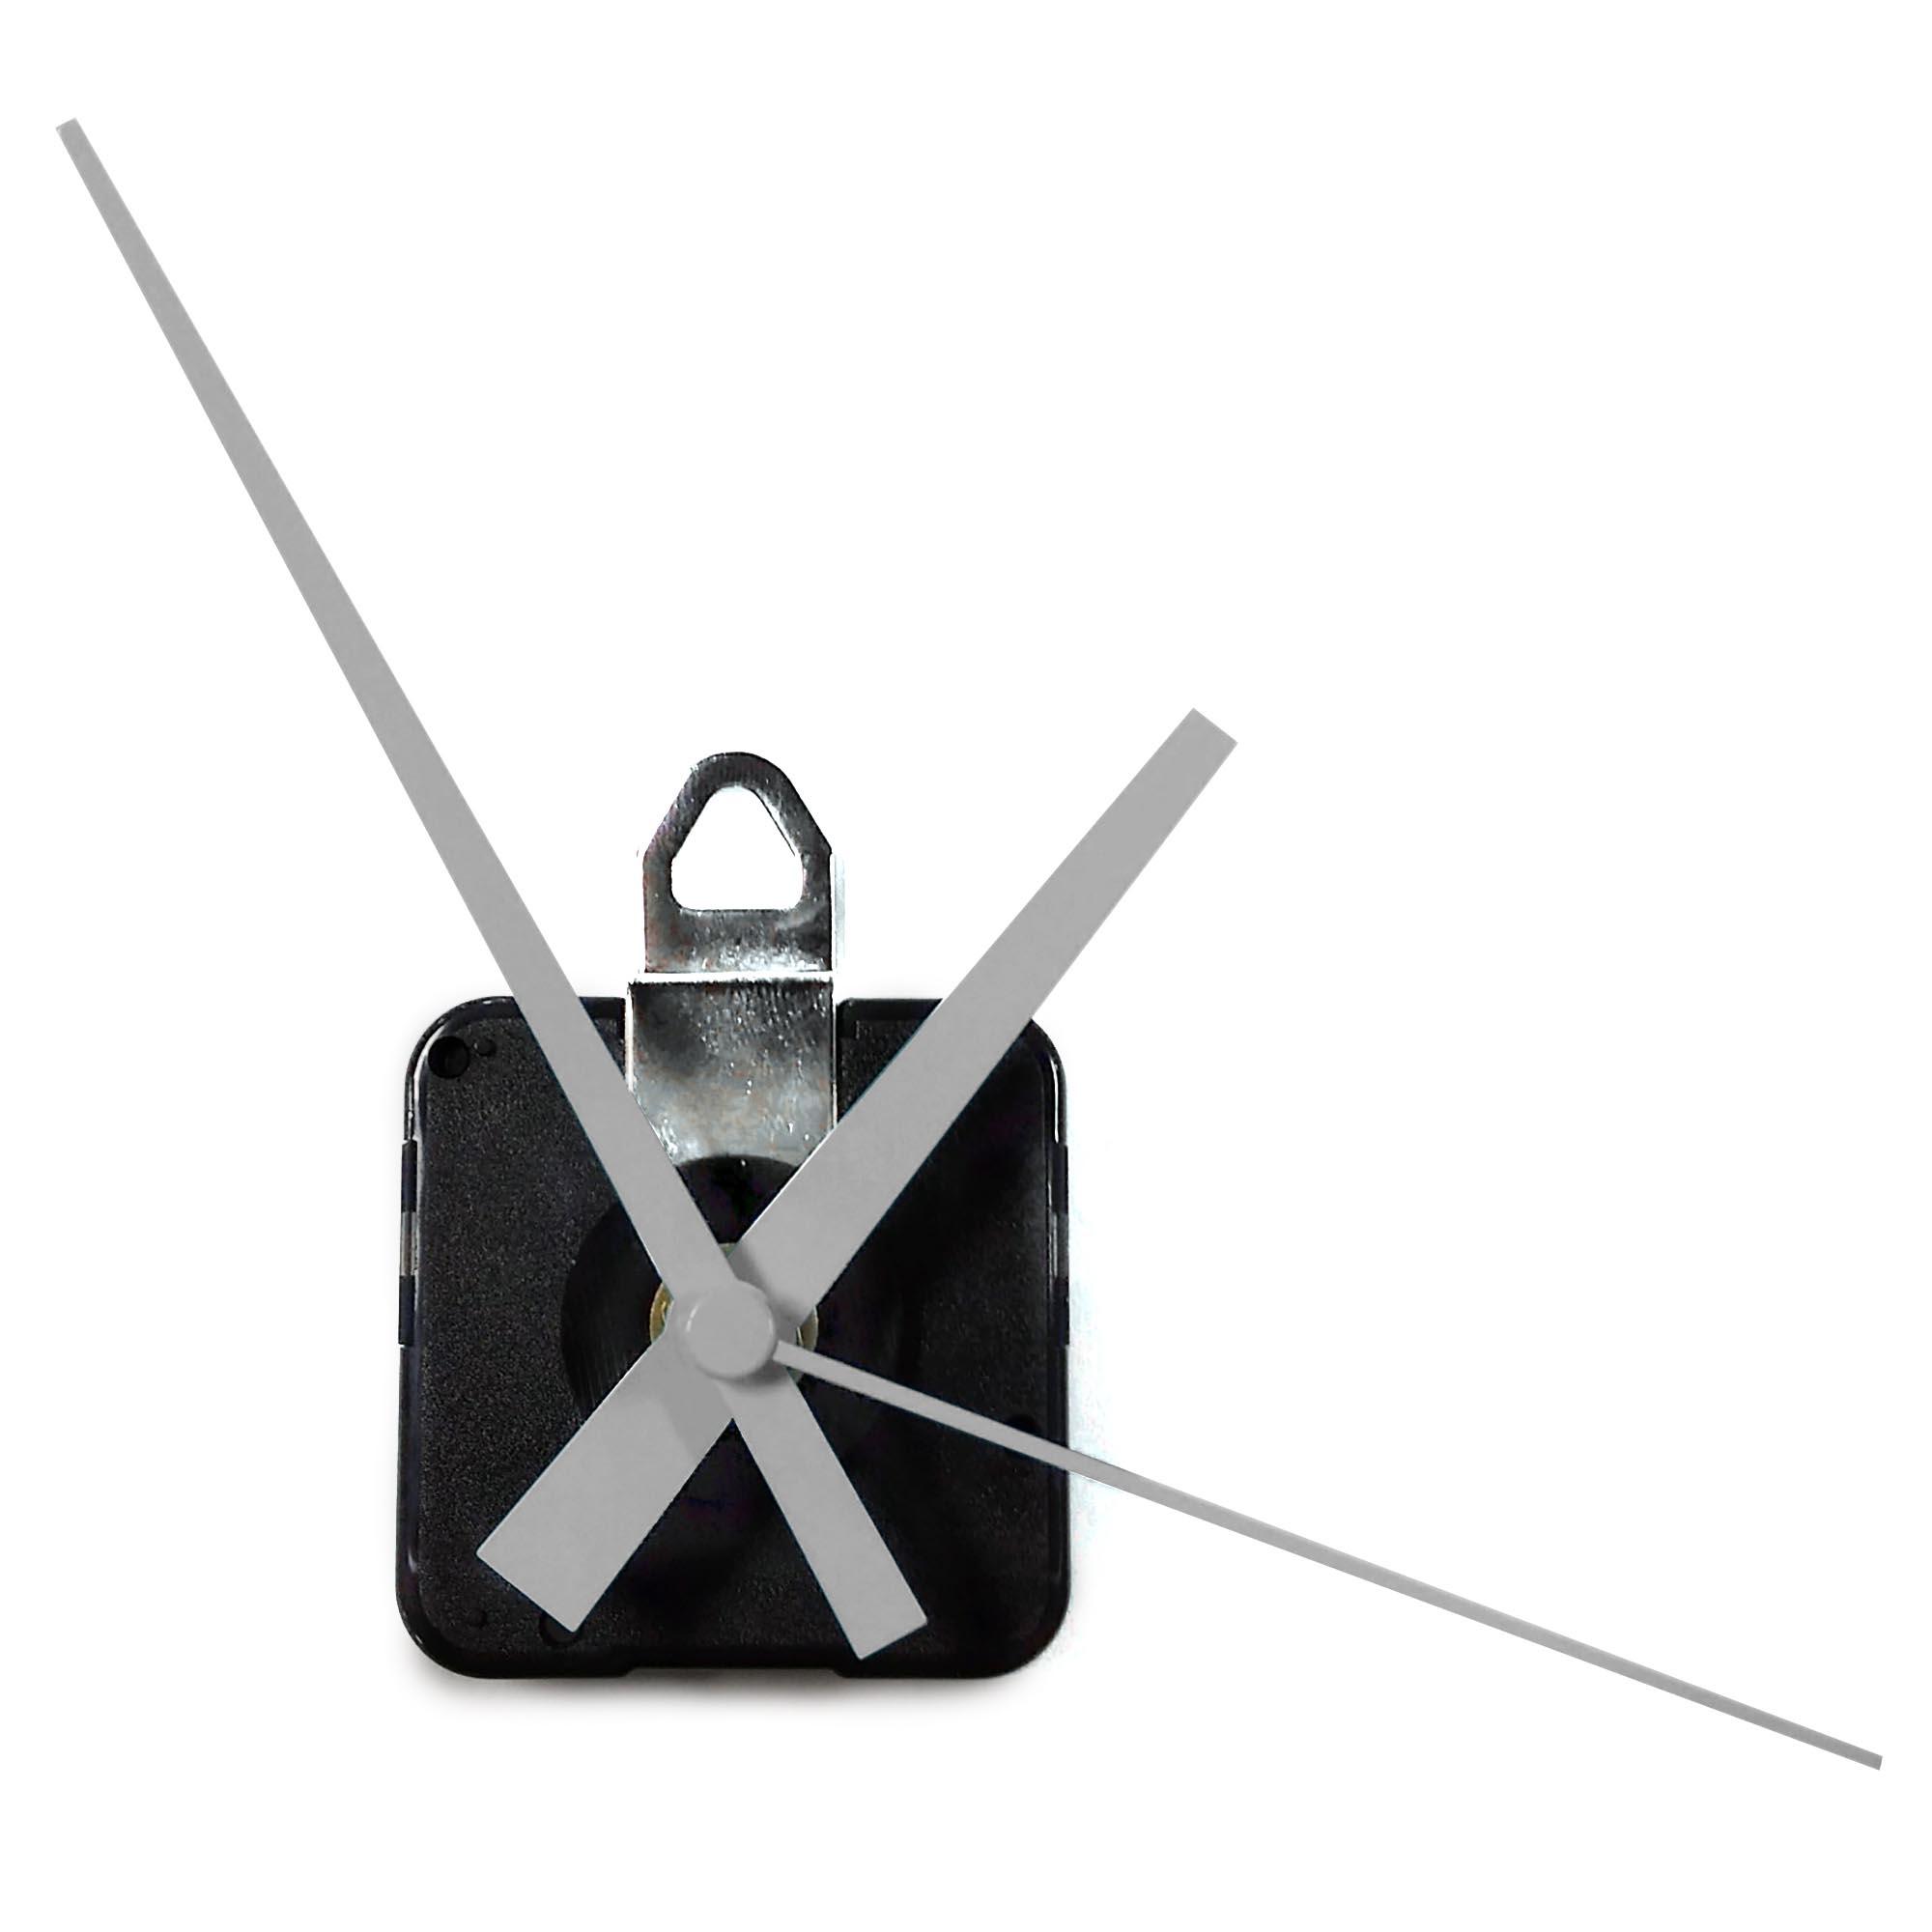 Replacement Clock Motor & Hands Set | Continuous-Sweep, High-Torque Mini Quartz Movement (Mid-Century Style Hands) - AC0001-MCM